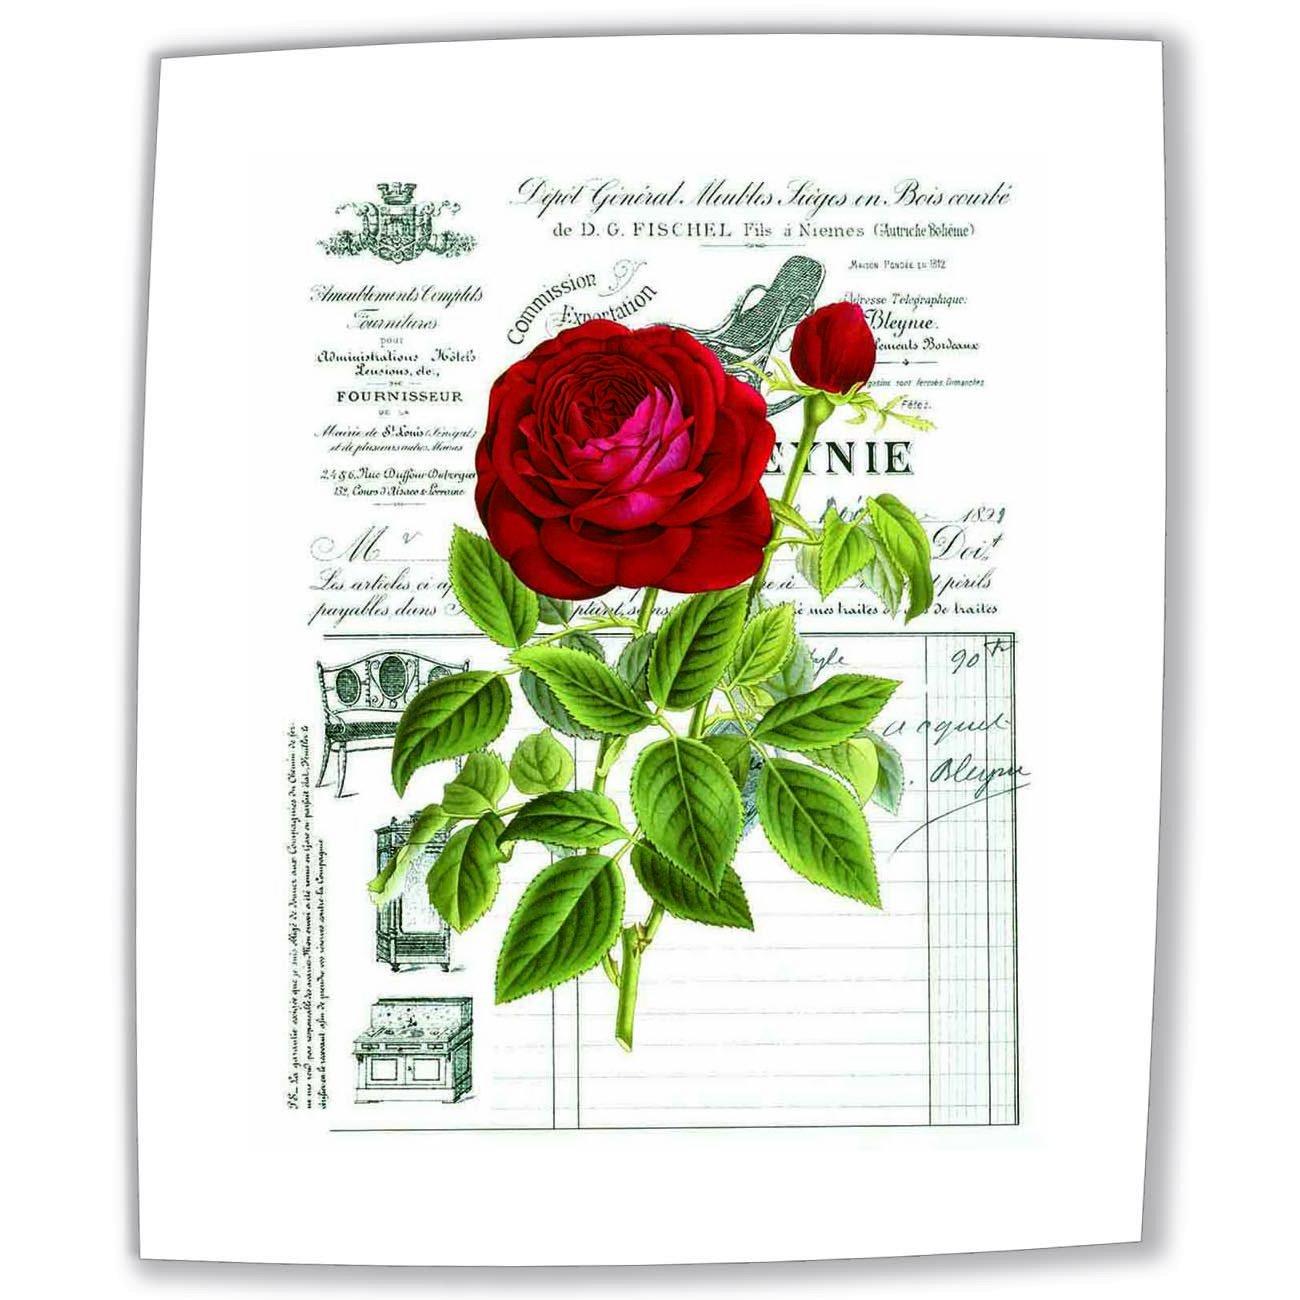 Cuadro sobre Lienzo - Rose V Pinturas Cuadros Con Flores Y Frases Vintage Pared Impresións - 40X50 cm: Amazon.es: Hogar